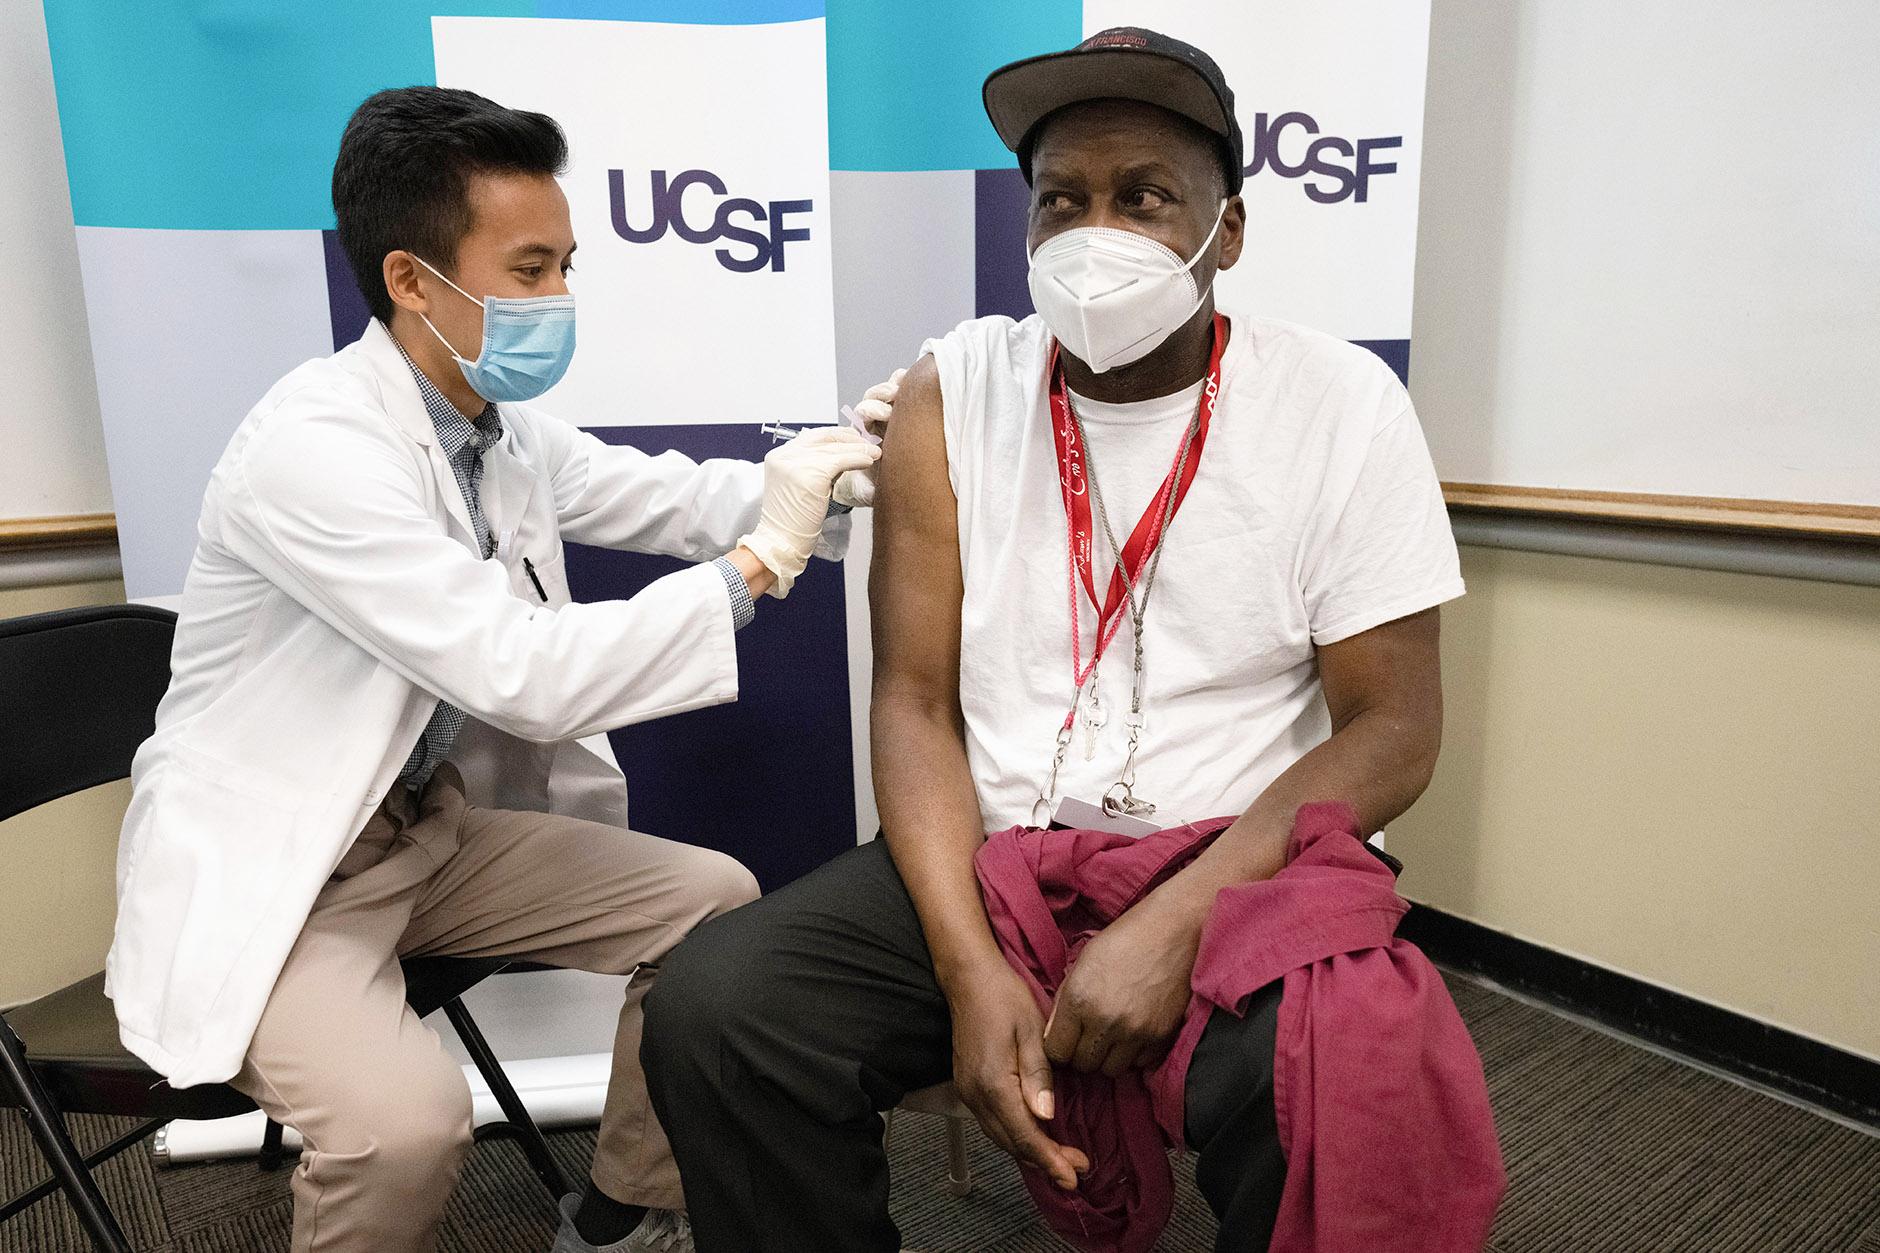 man receives COVID-19 vaccination shot